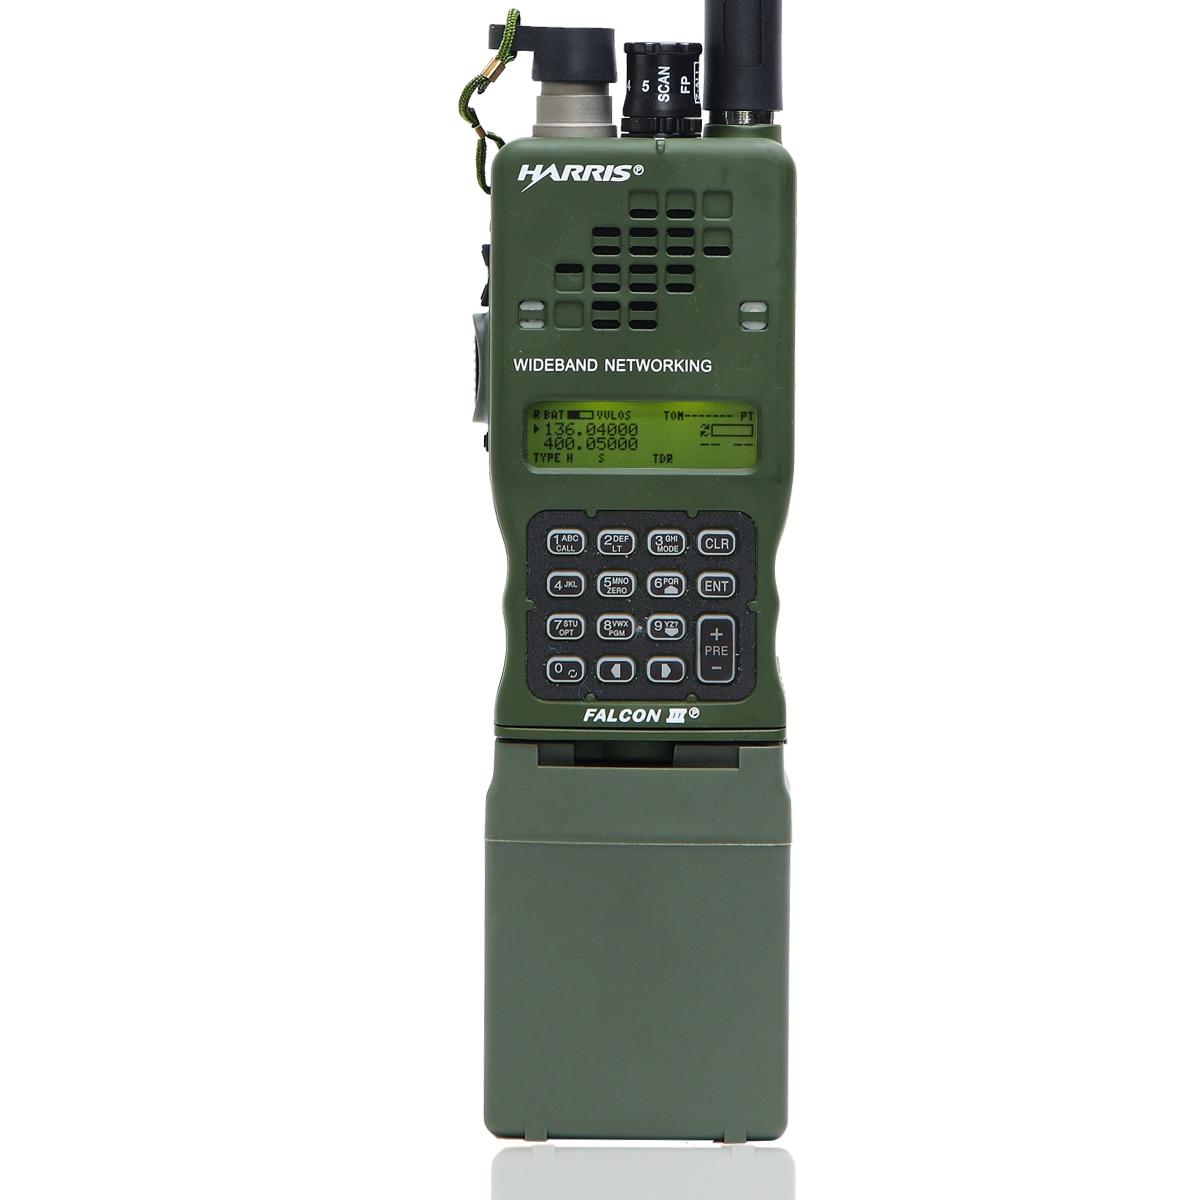 TCA AN PRC 152A UV IPX7 Army Tactical CS VHF UHF Dual Band Military MBITR Aluminum